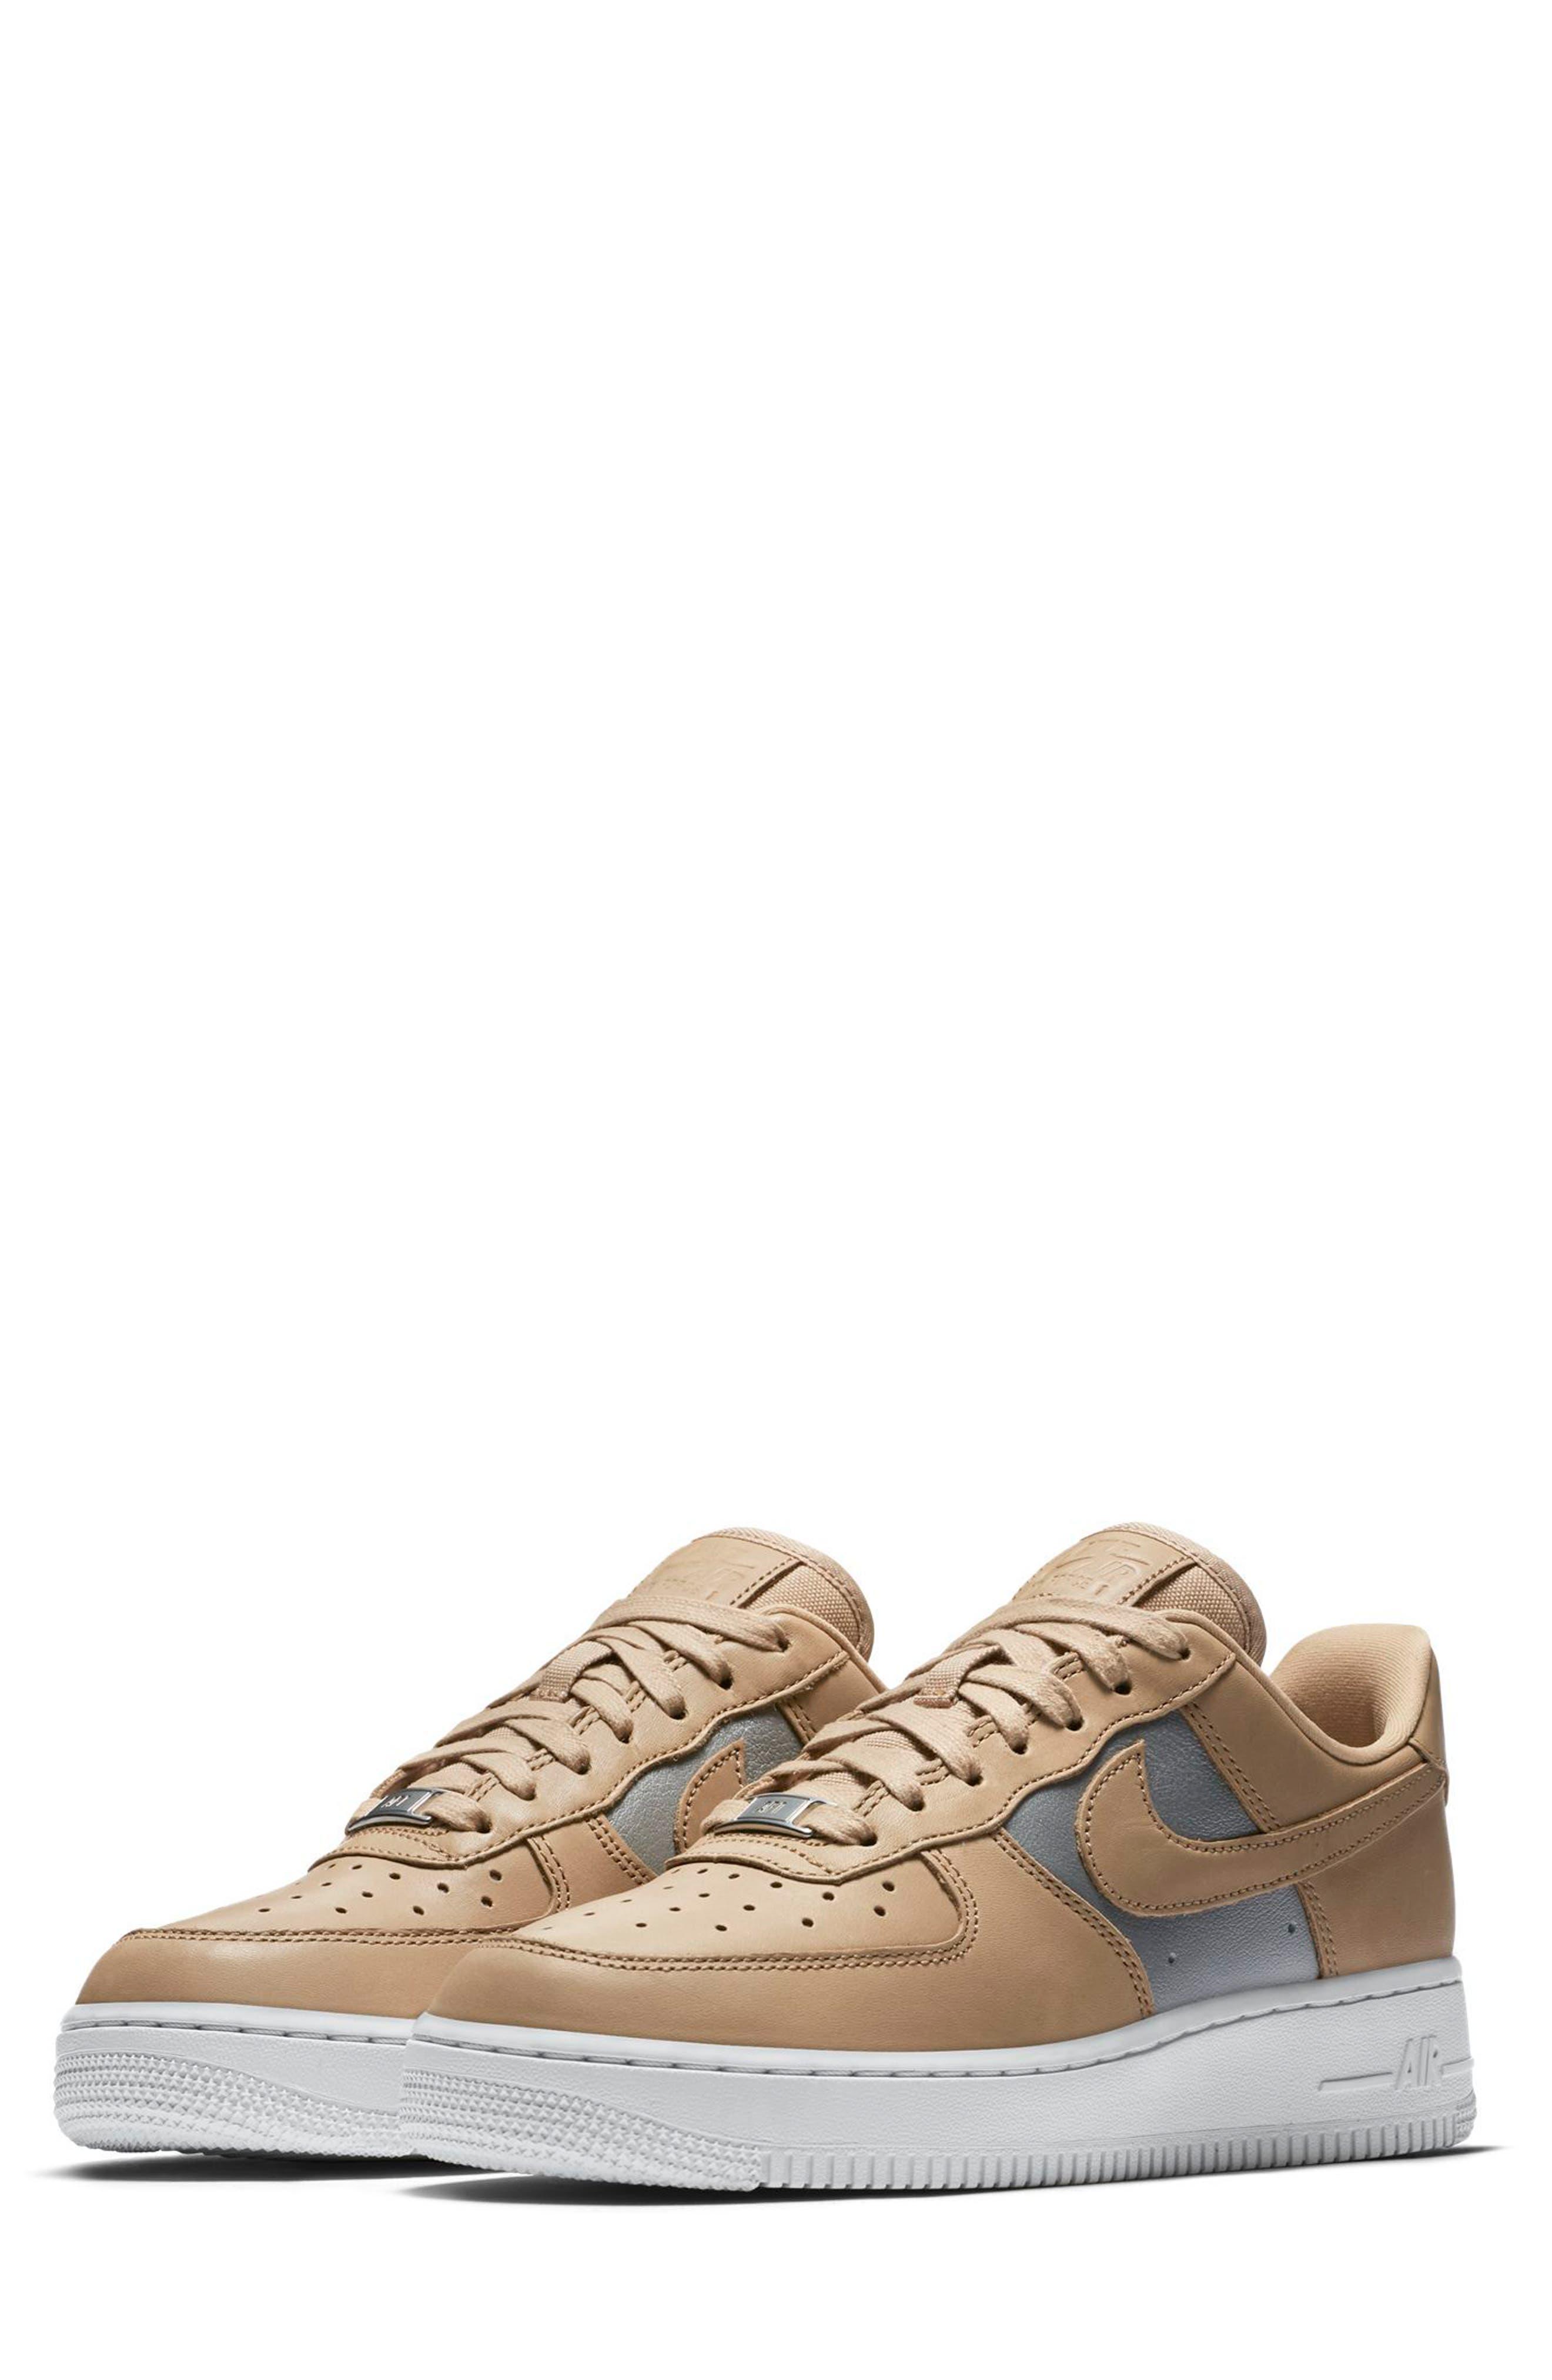 Air Force 1 '07 SE Premium Sneaker,                             Main thumbnail 1, color,                             Beige/ Silver/ White